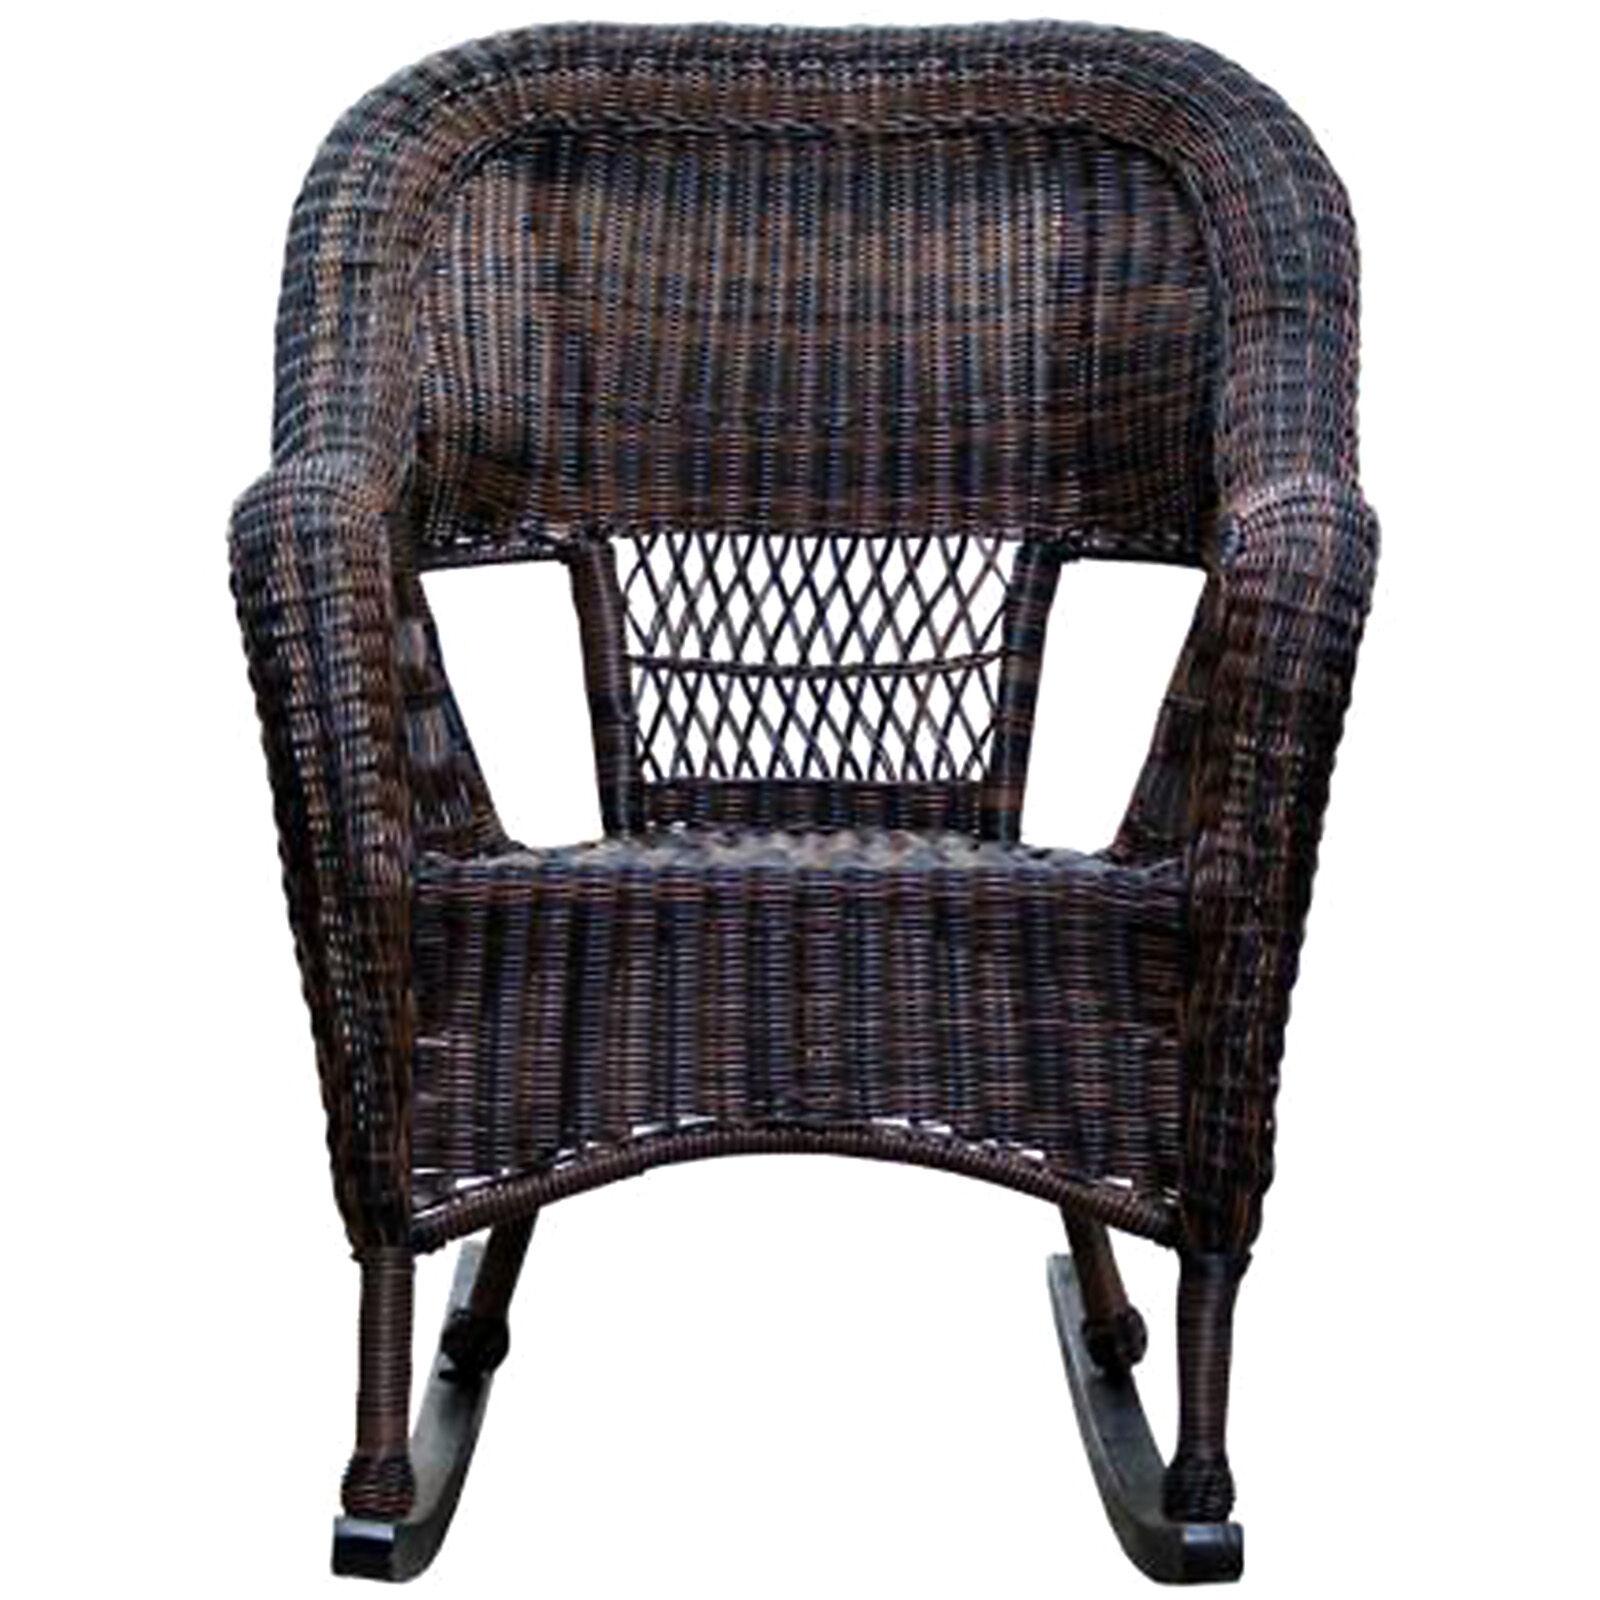 Dark Brown Wicker Outdoor Patio Rocking Chair Home